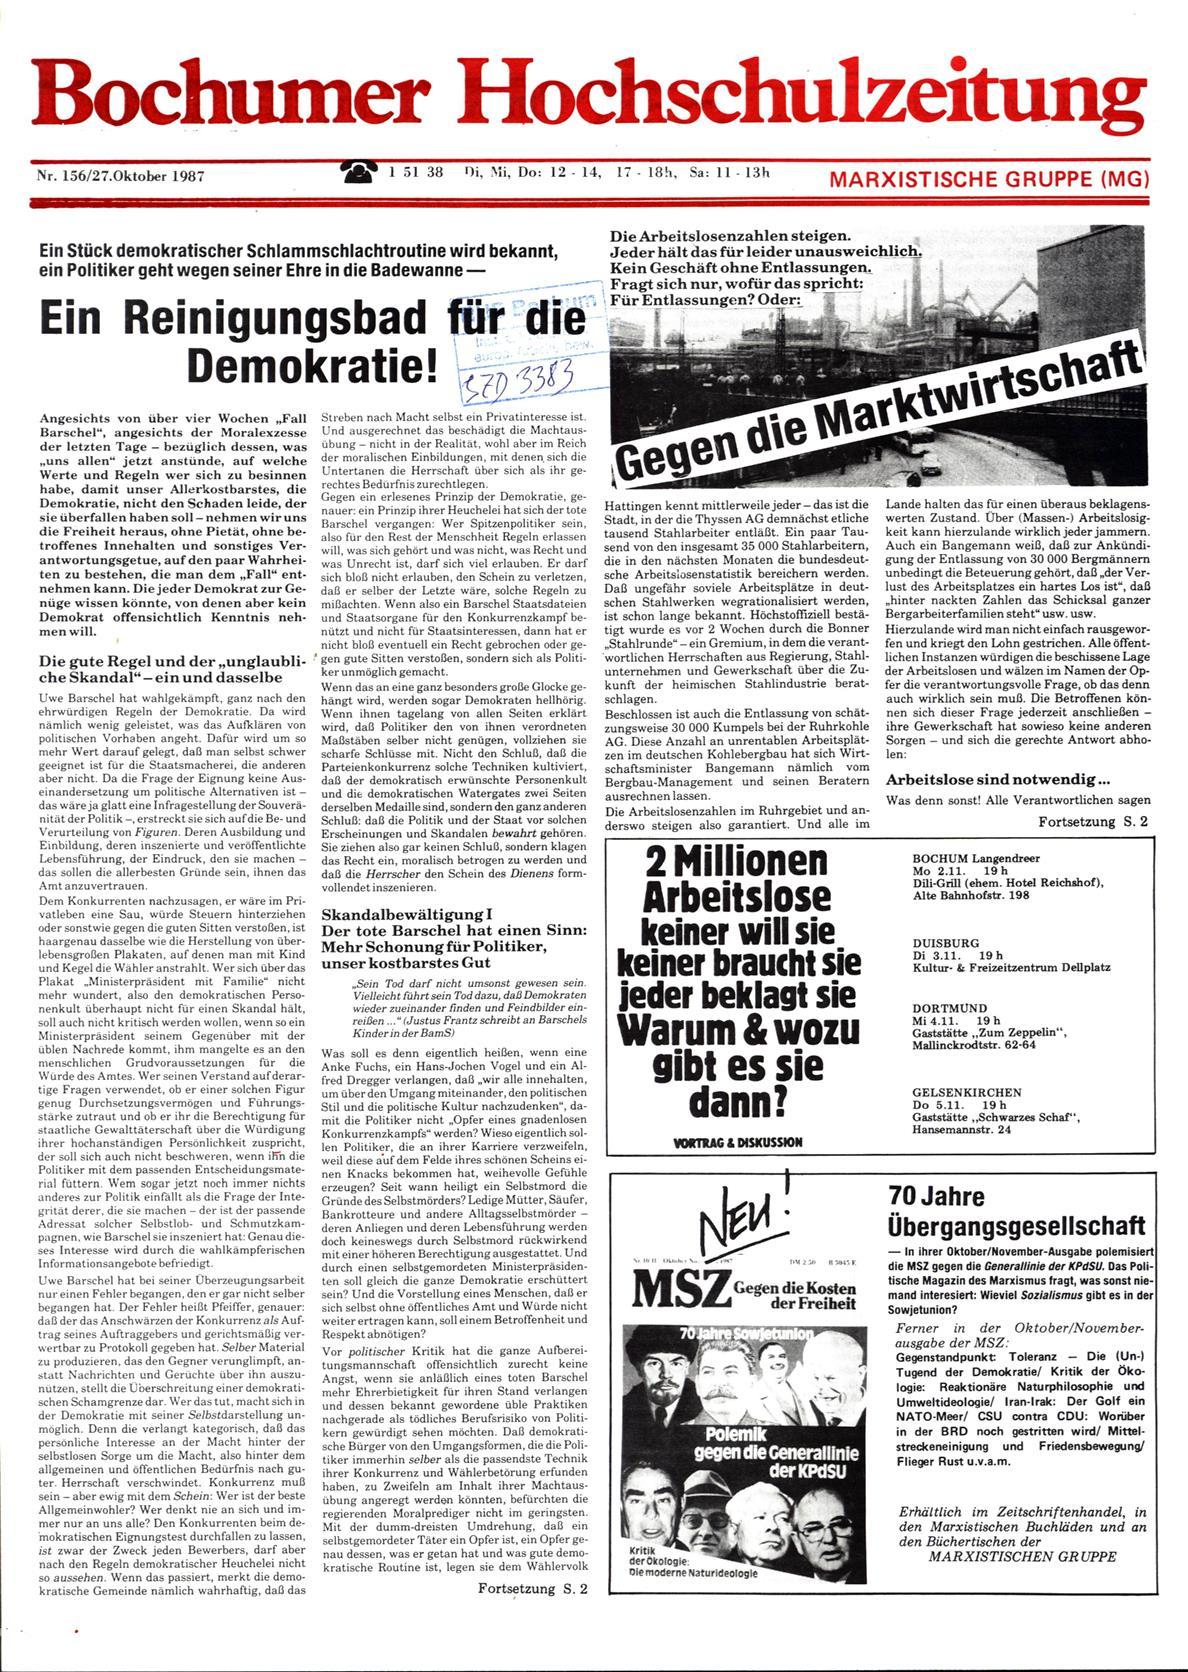 Bochum_BHZ_19871027_156_001